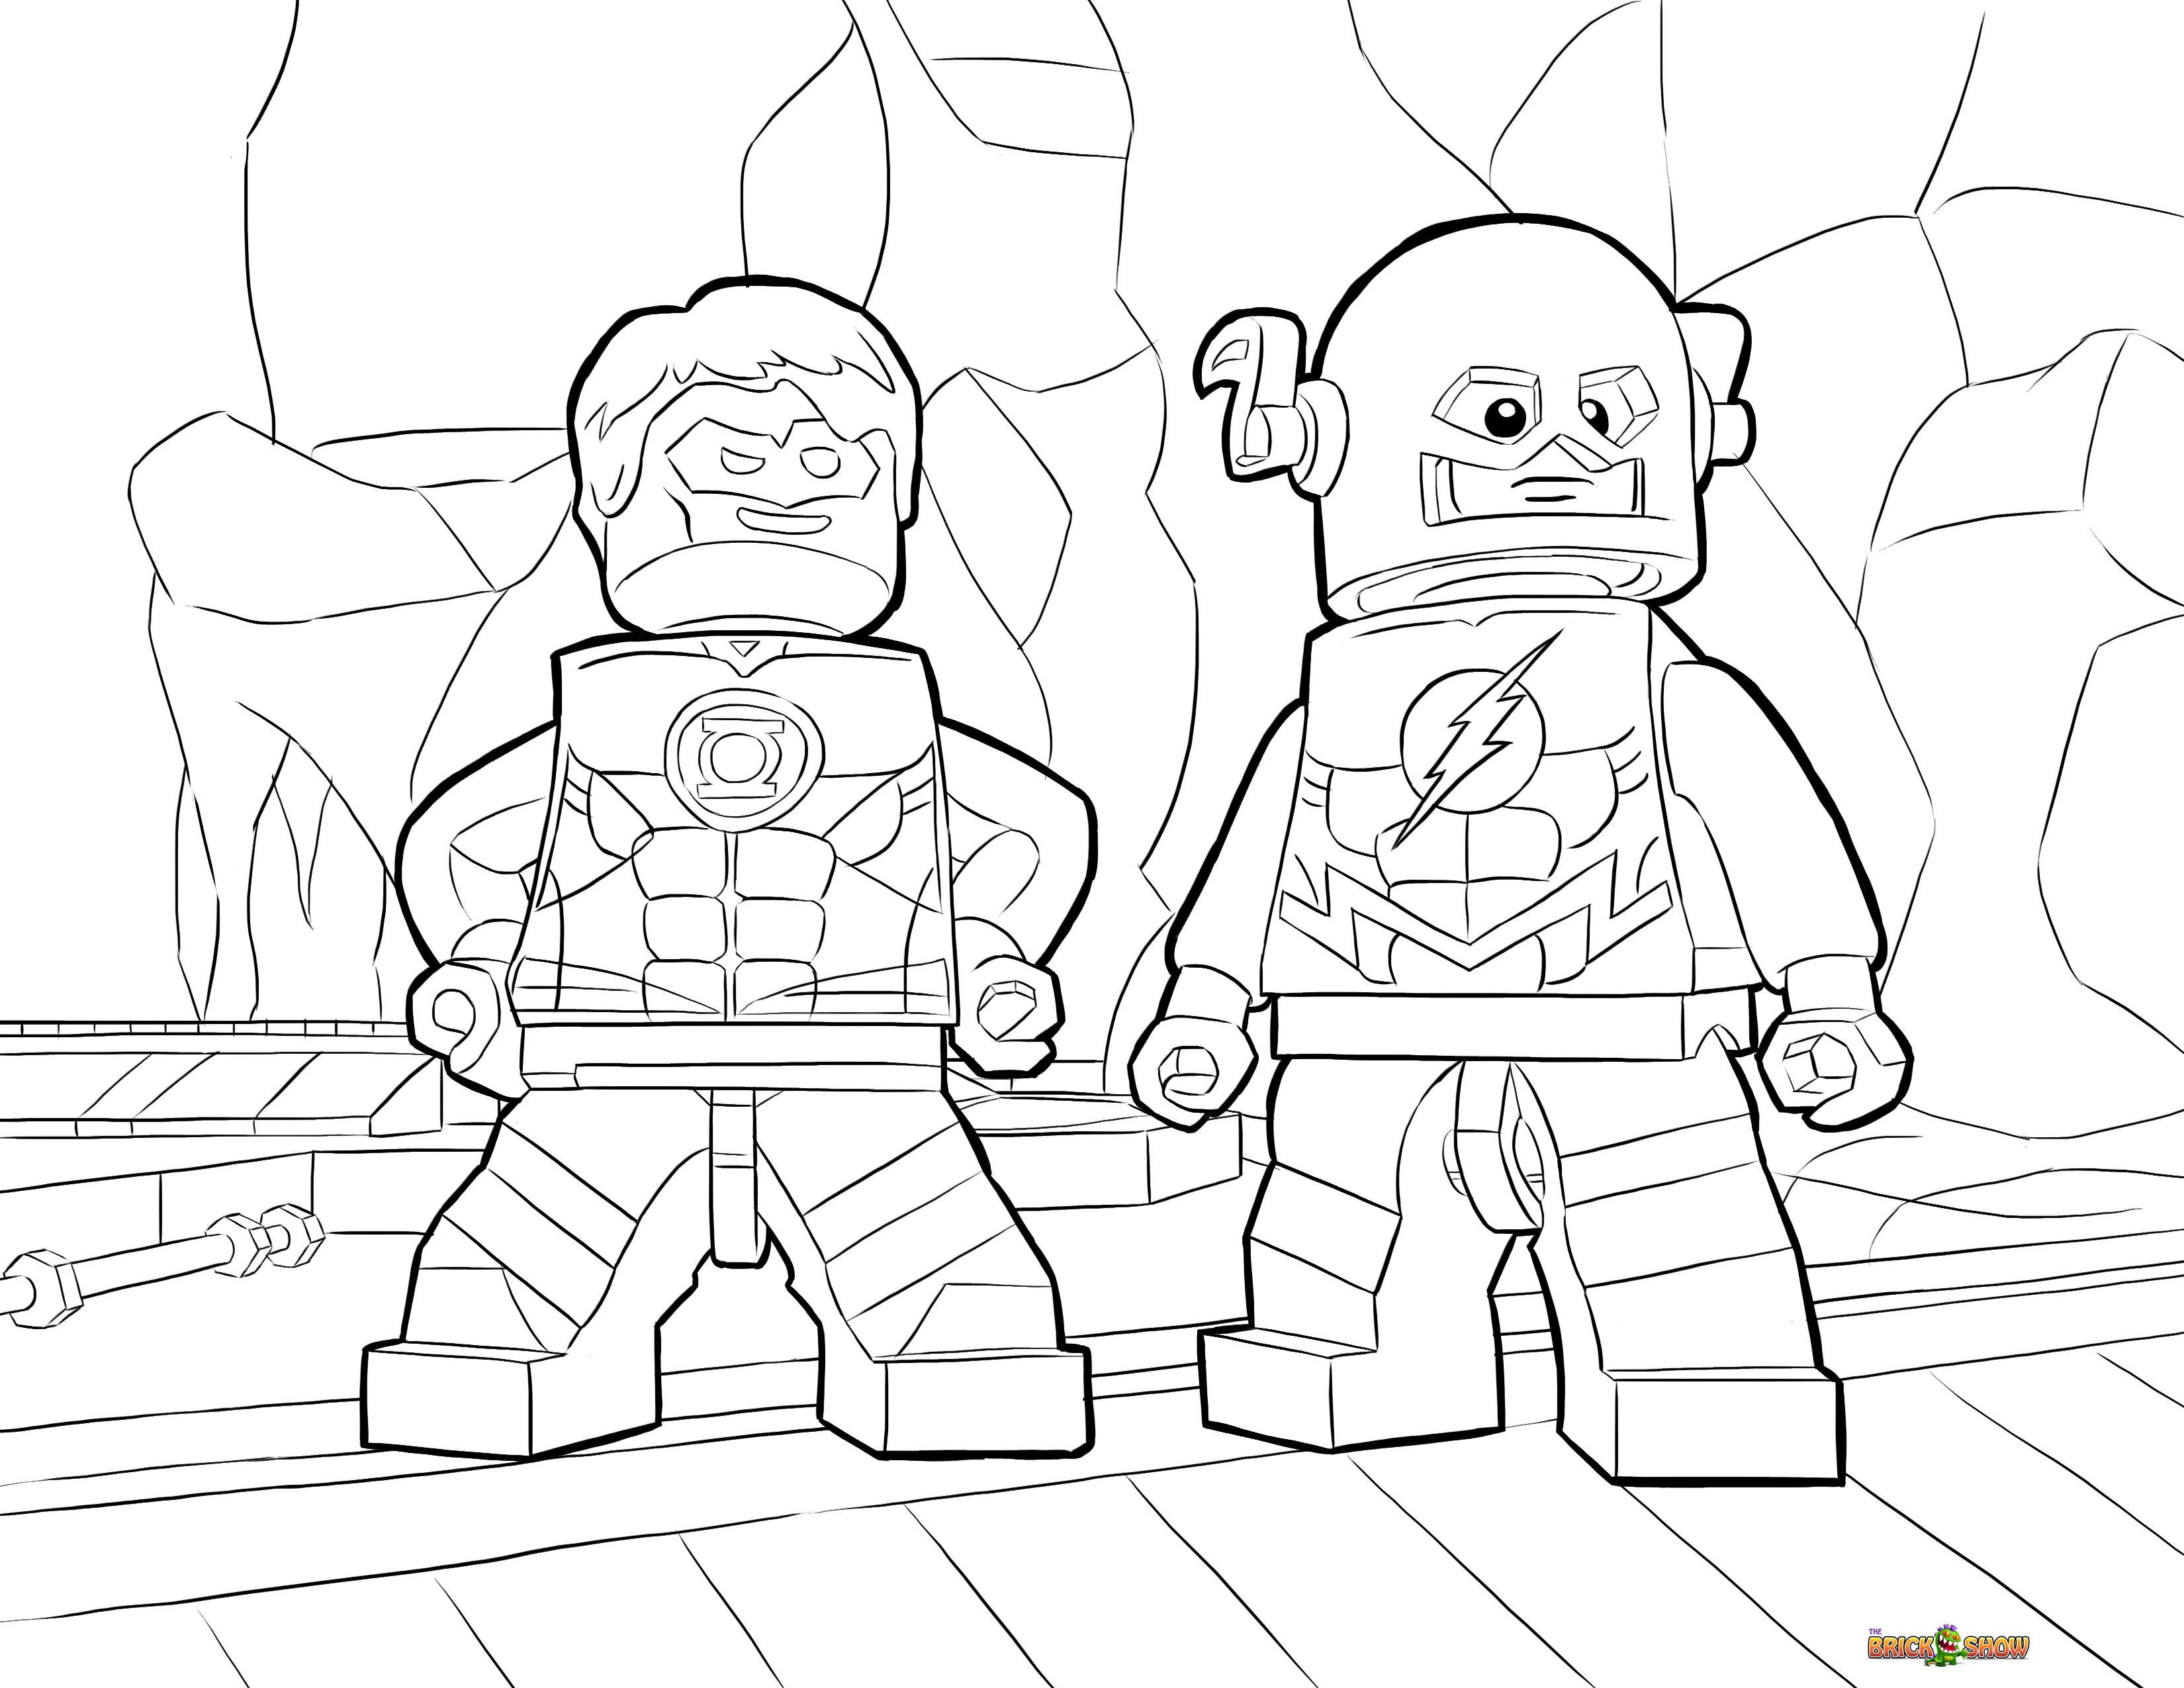 Lego People Drawing At Getdrawings